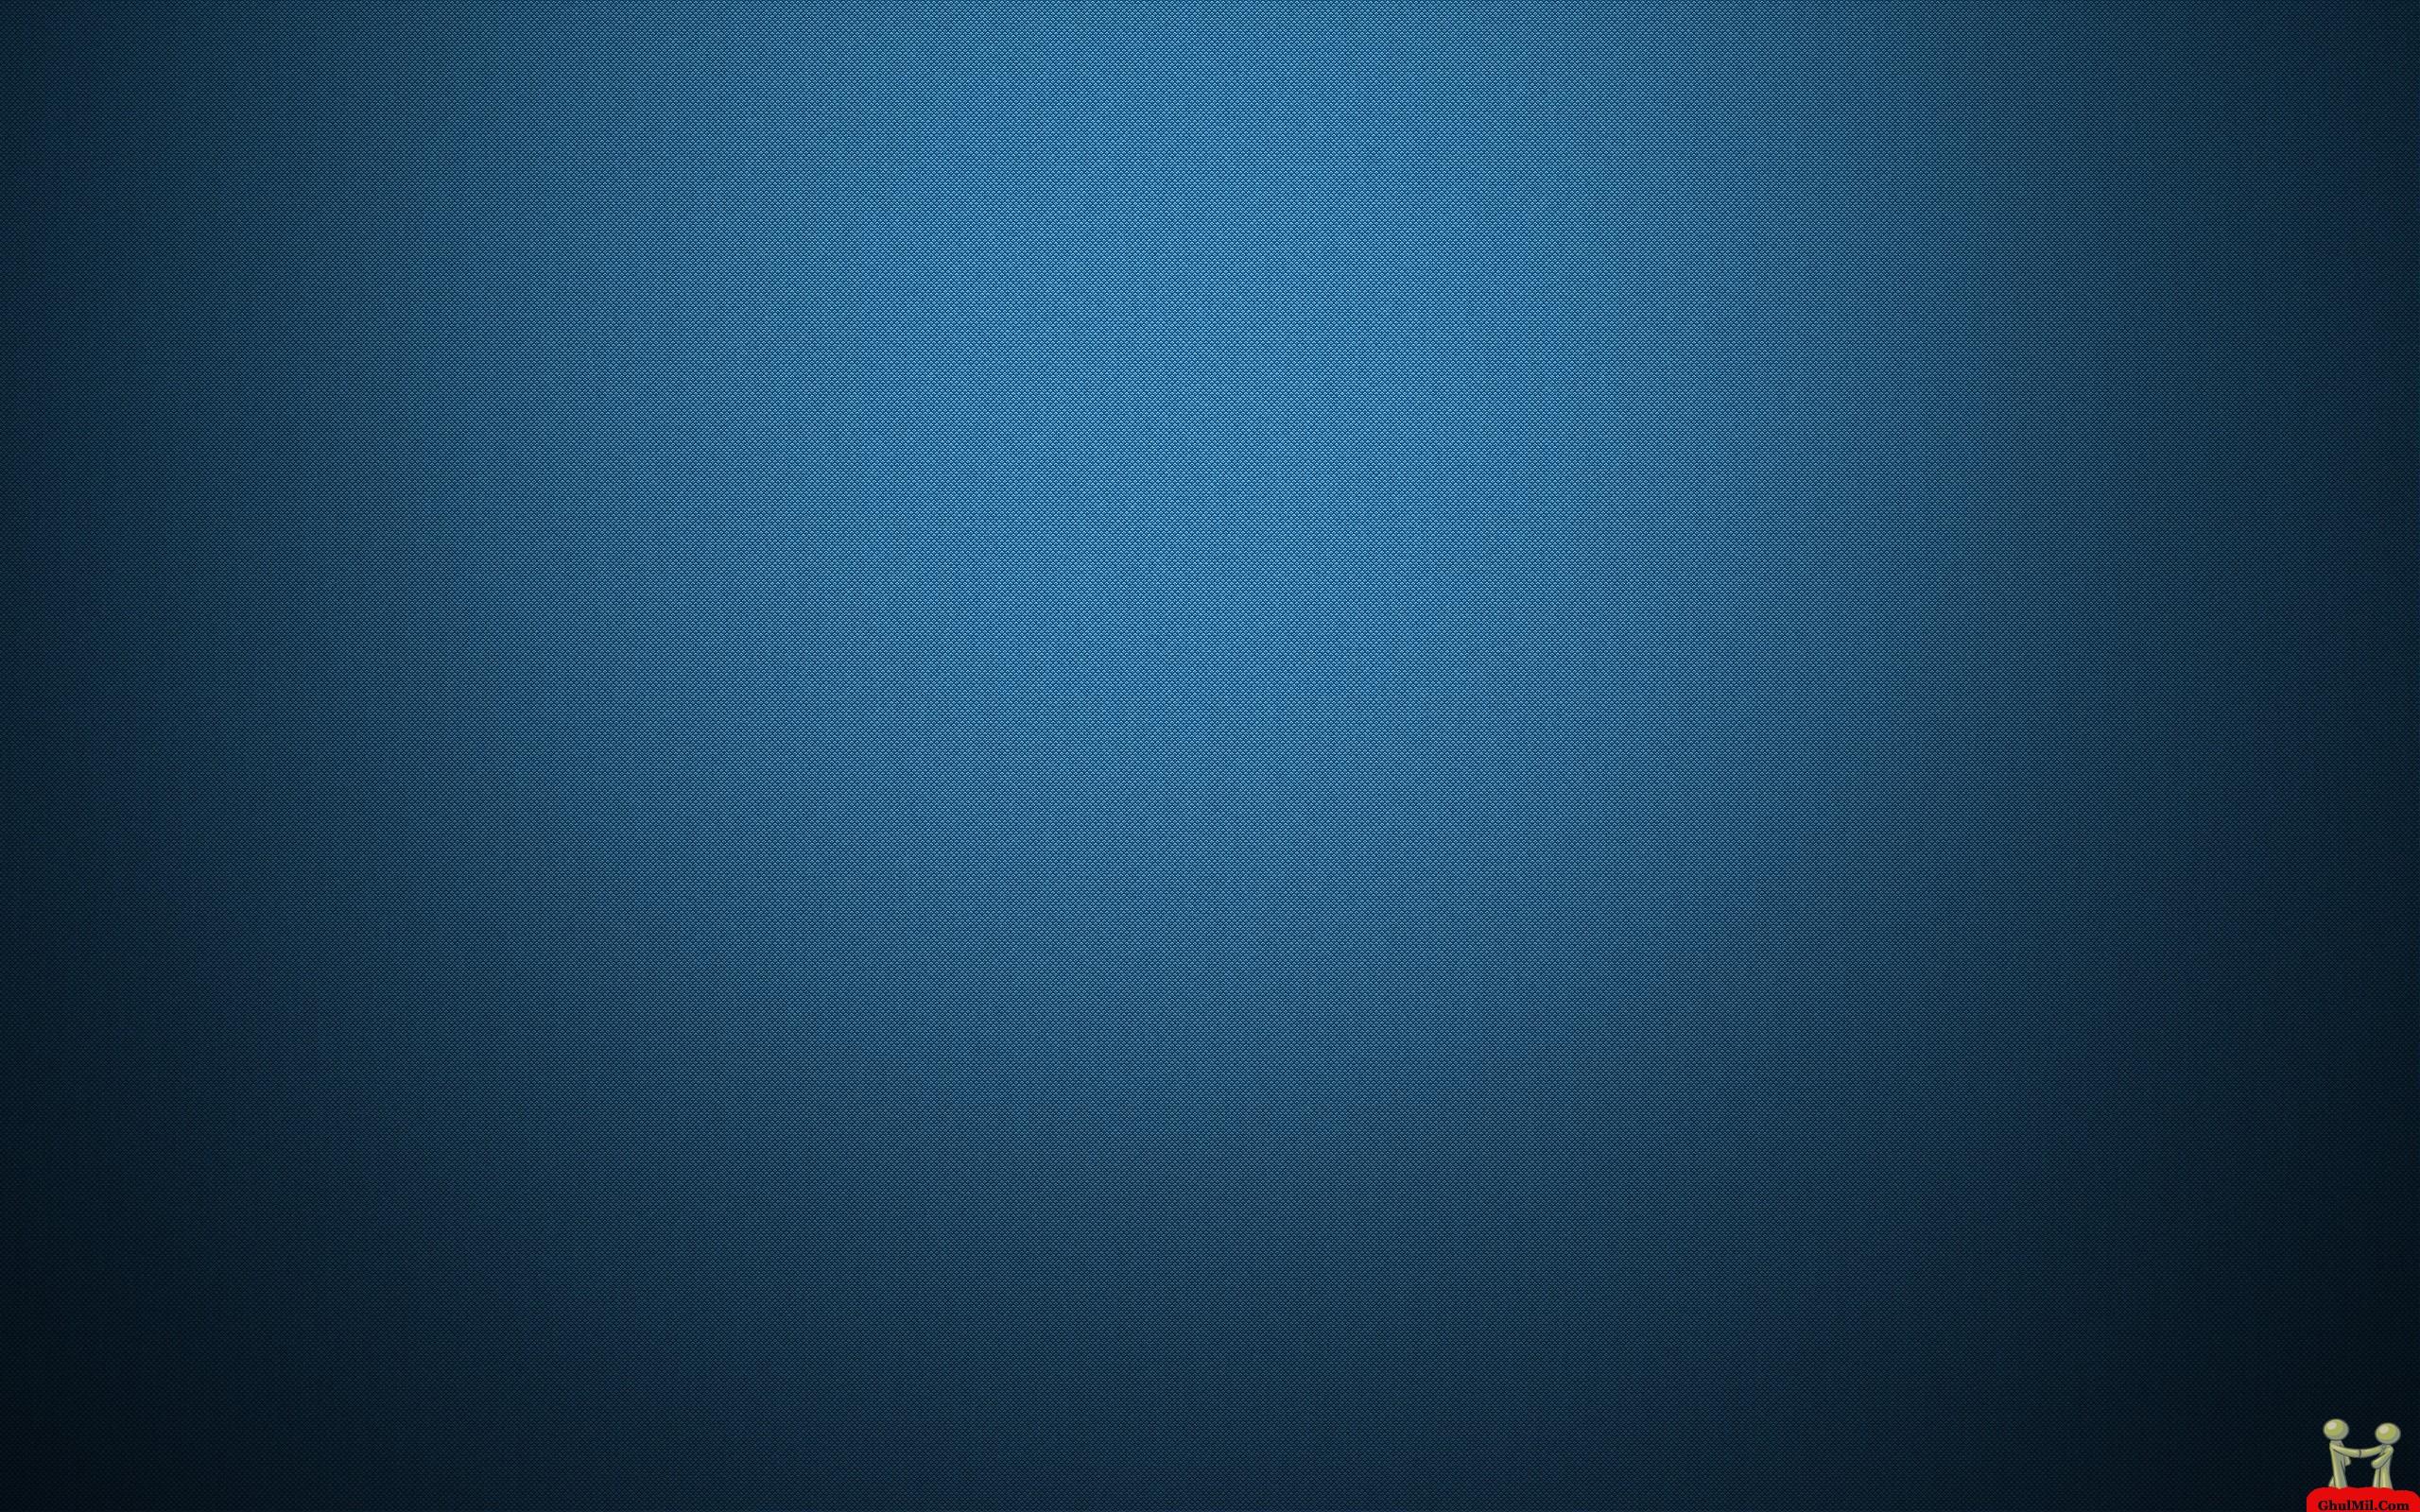 Blue Stone Sheet HD Wallpaper E Entertainment 2560x1600